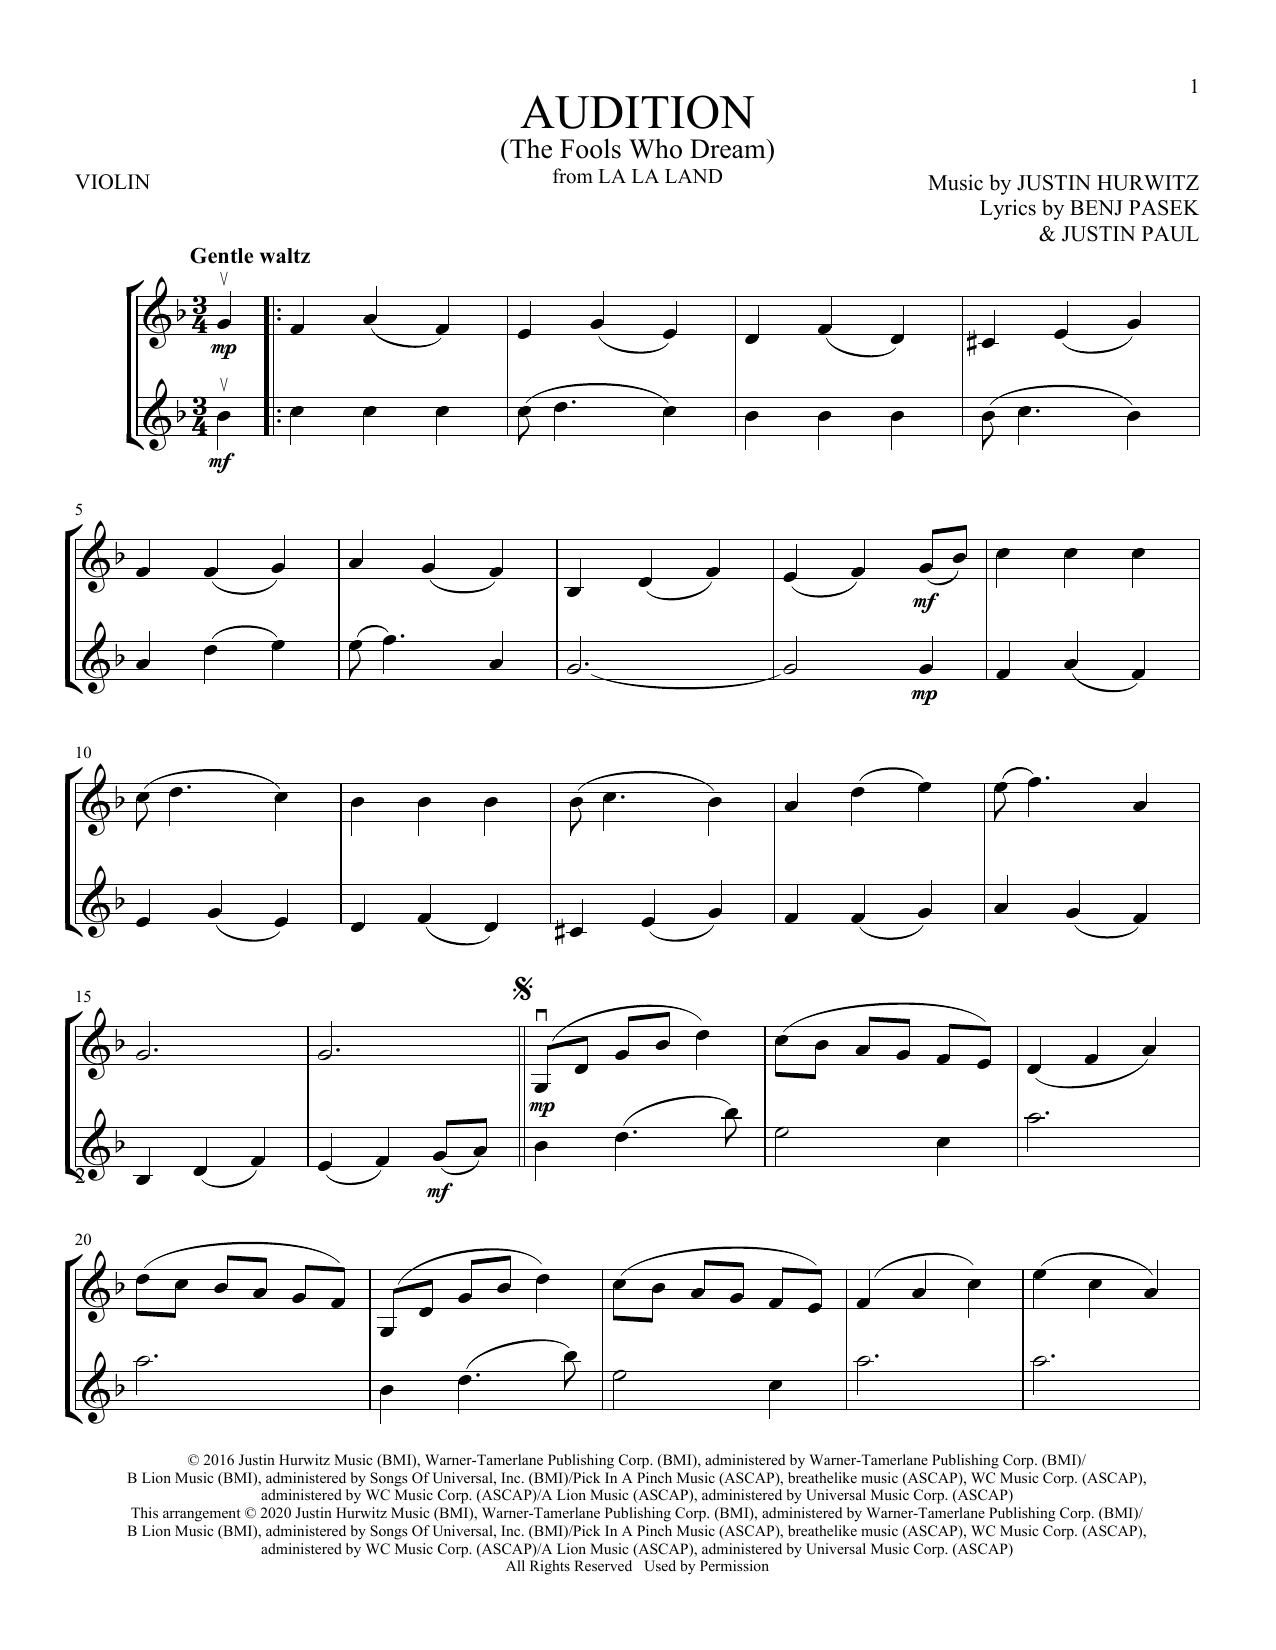 Audition (The Fools Who Dream) (from La La Land) (Violin Duet)